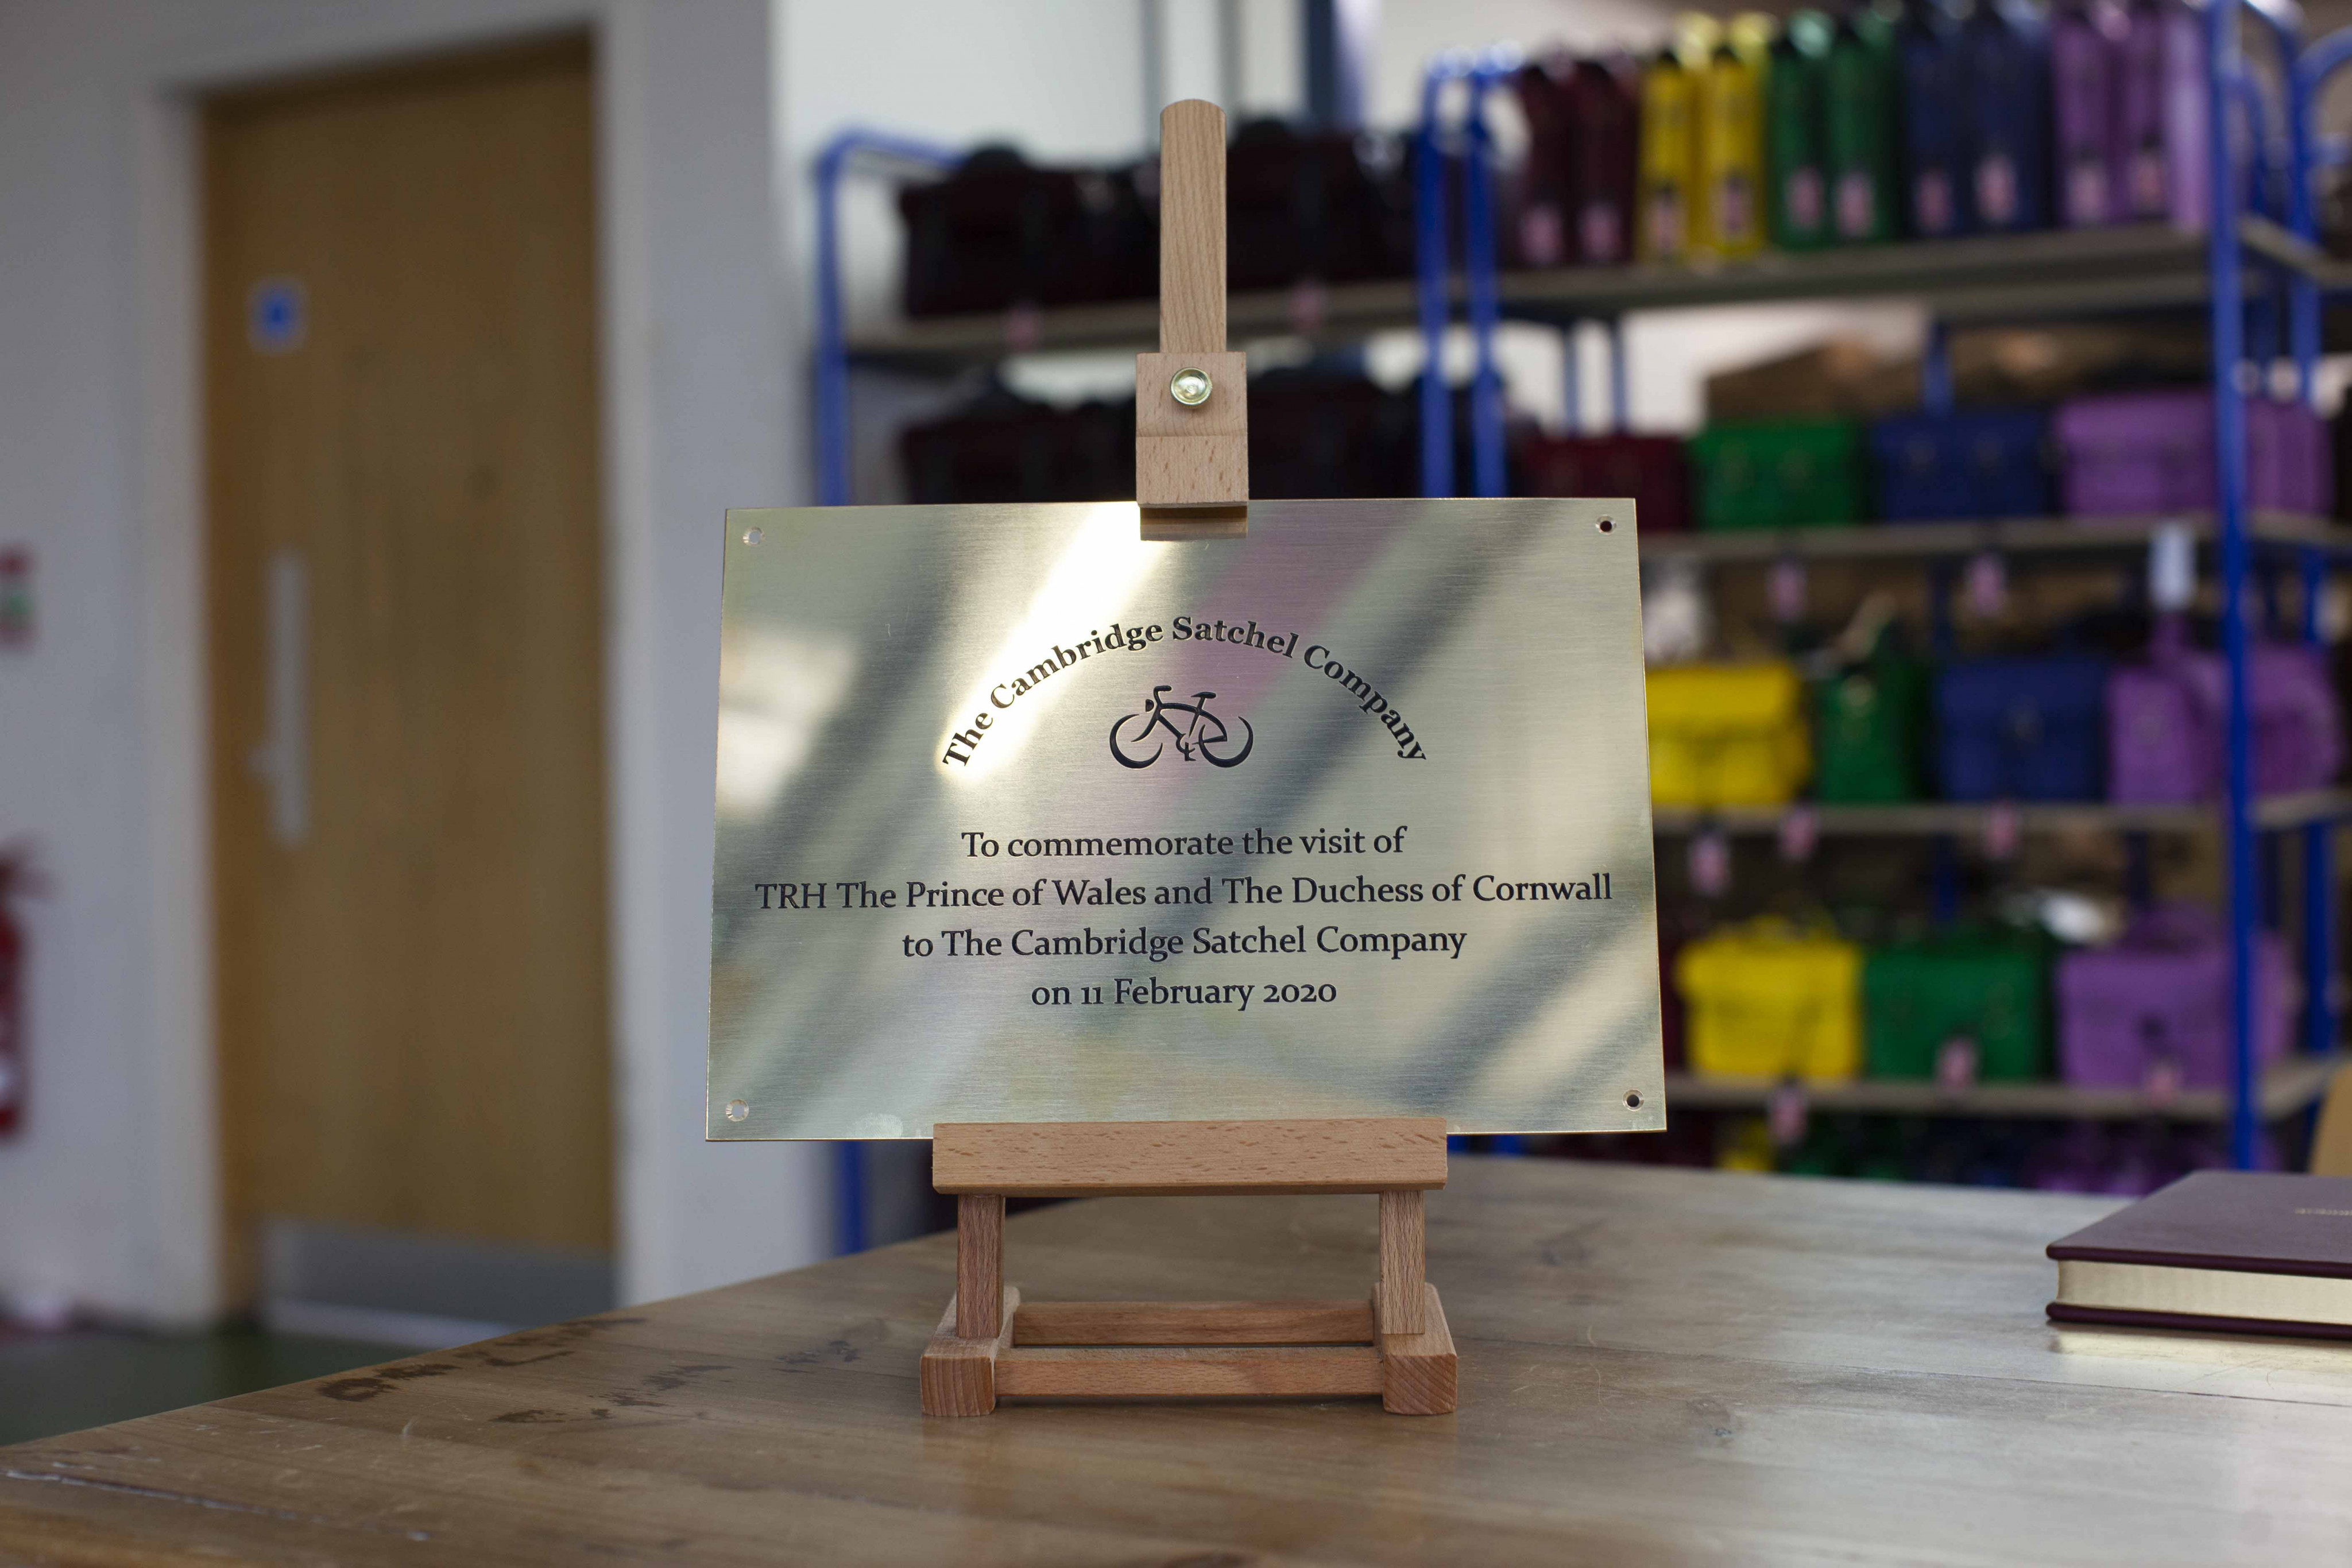 HRH plaque at The Cambridge Satchel Company